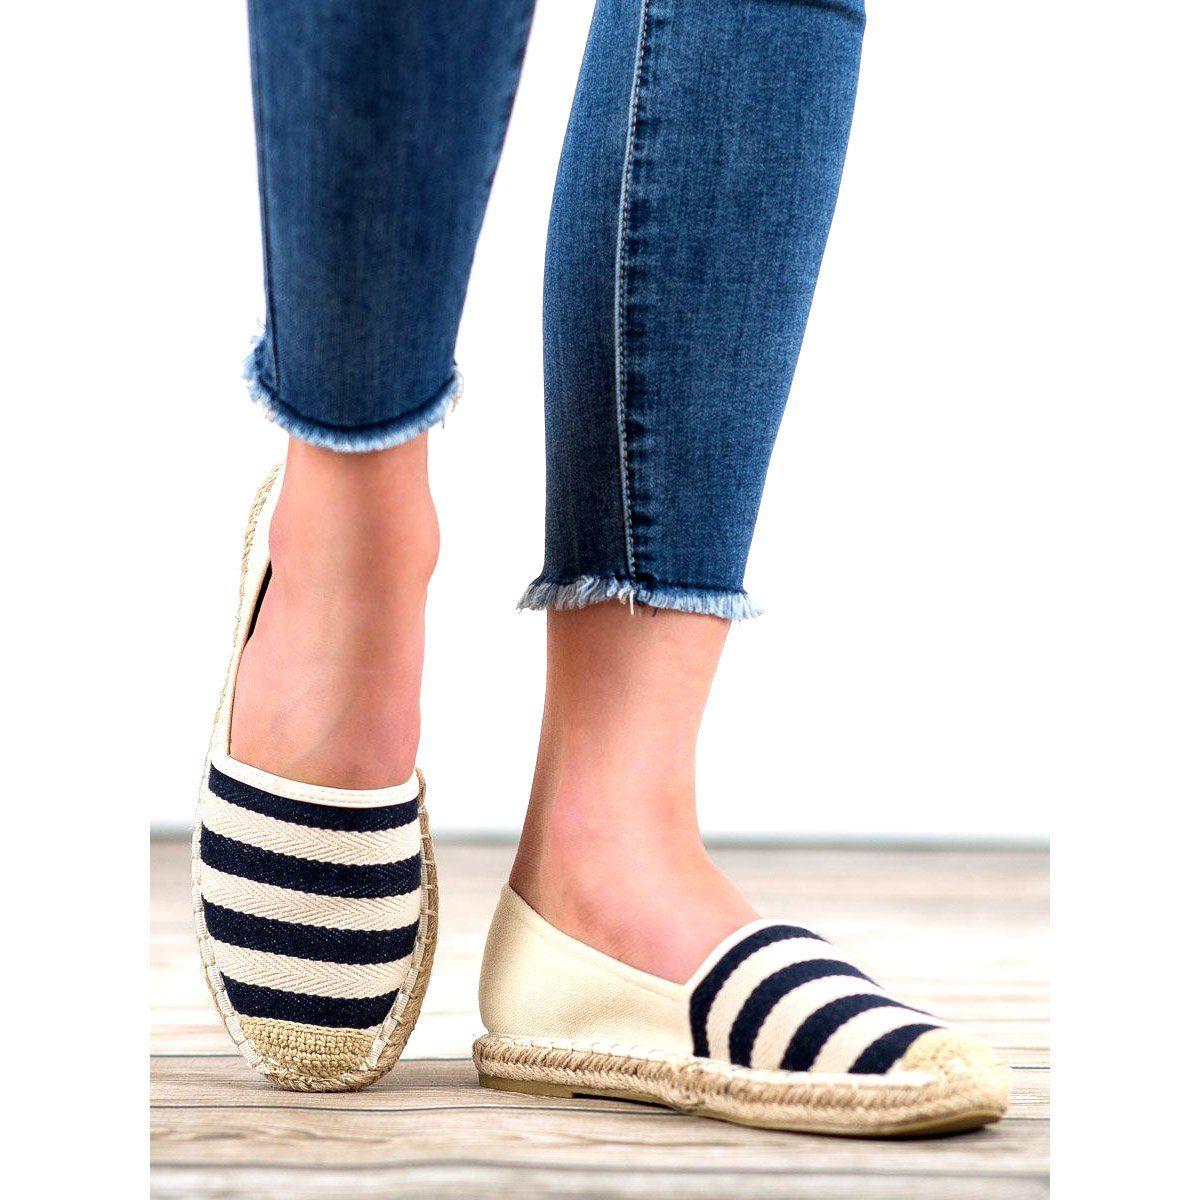 Espadryle Damskie Bellamila Bellamila Brazowe Espadryle W Paski Espadrilles Shoes Fashion